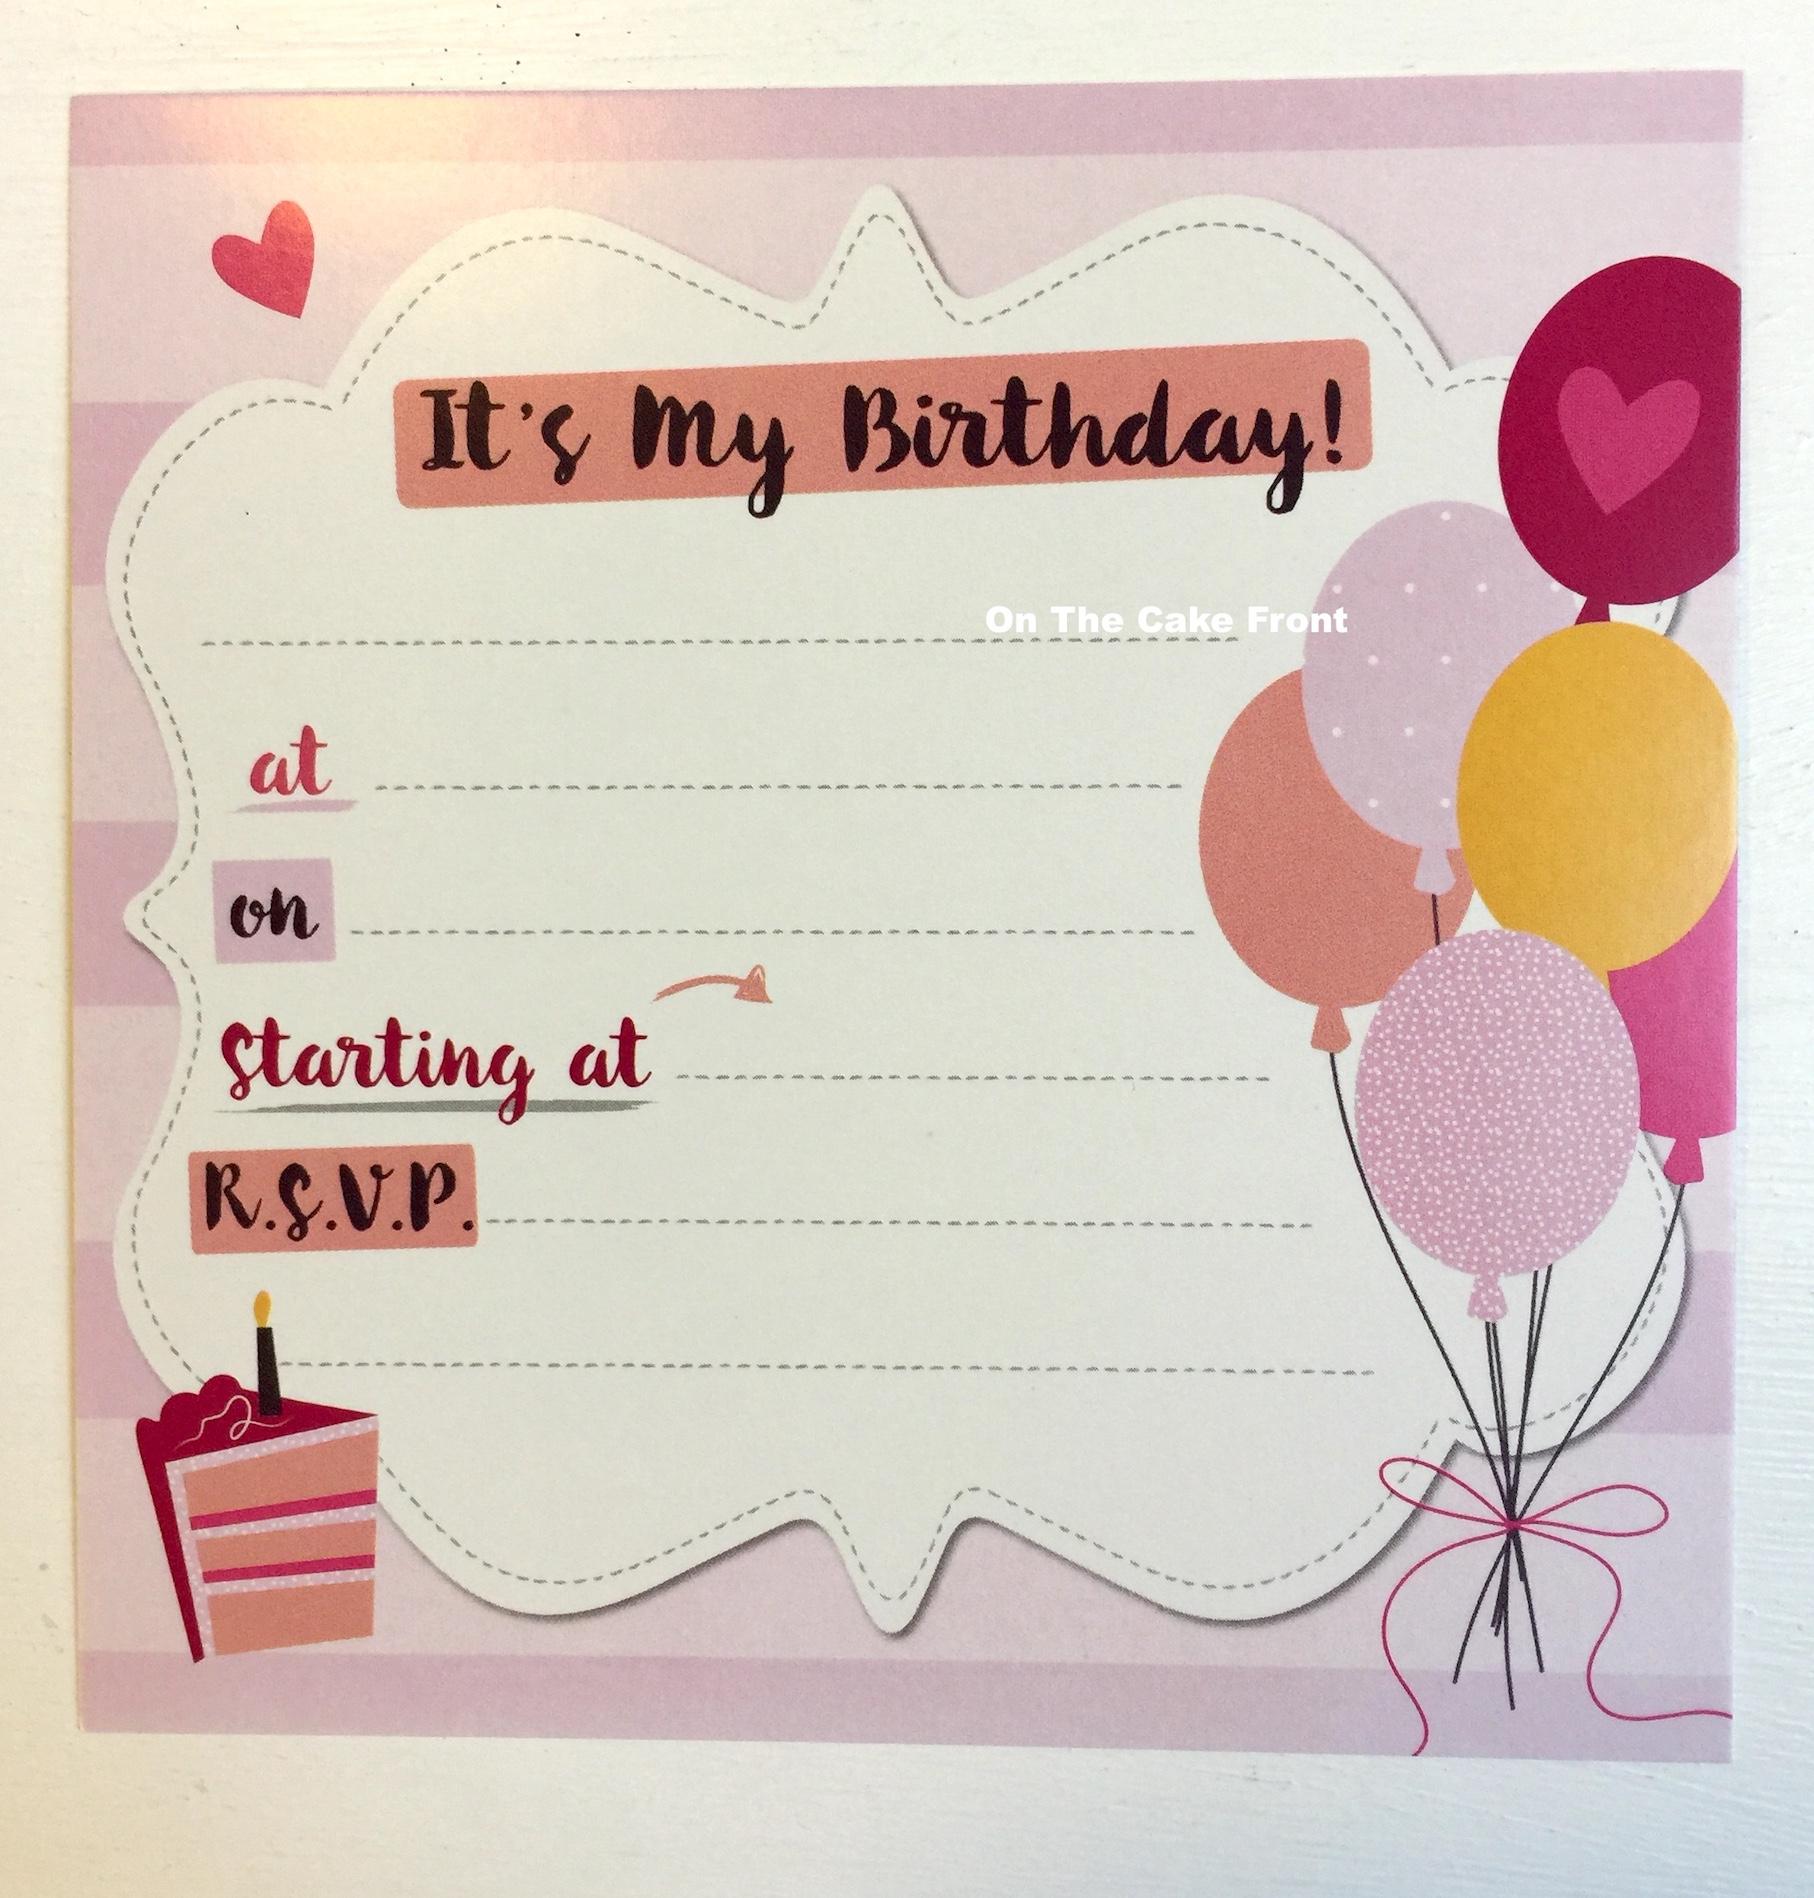 16 Pink balloons & birthday cake party invitations & envelopes